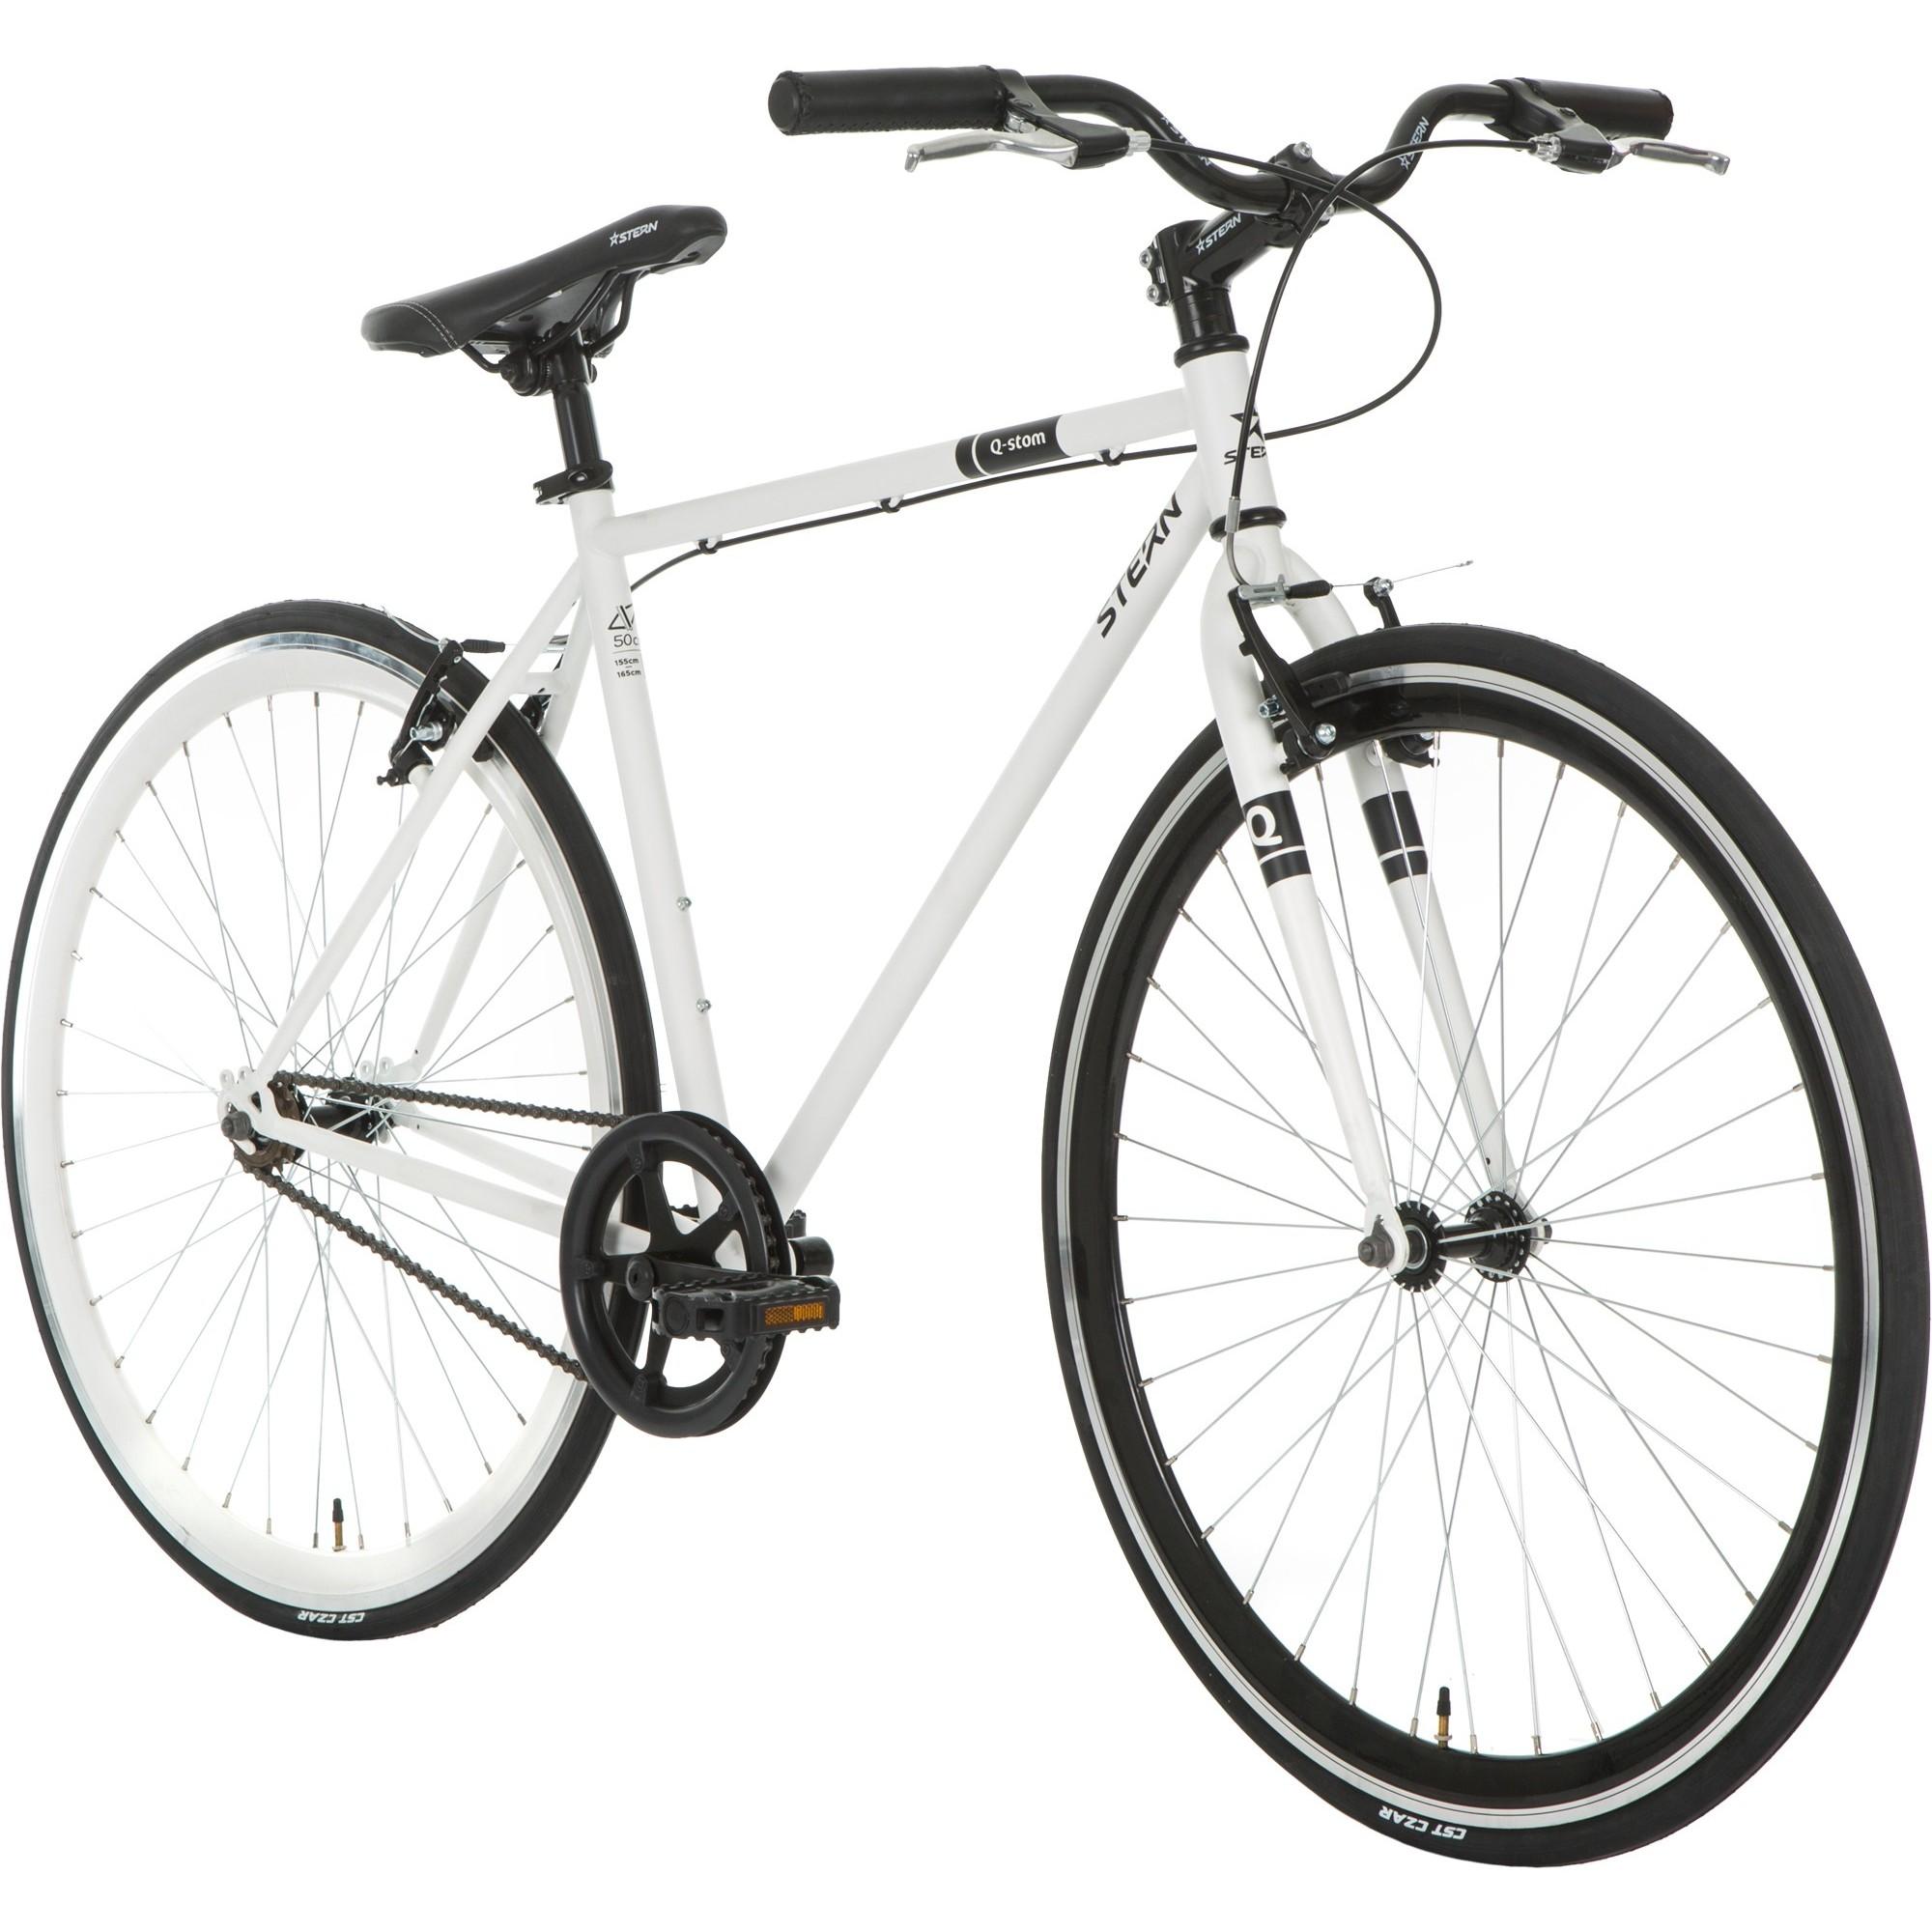 Стерн Велосипед Интернет Магазин